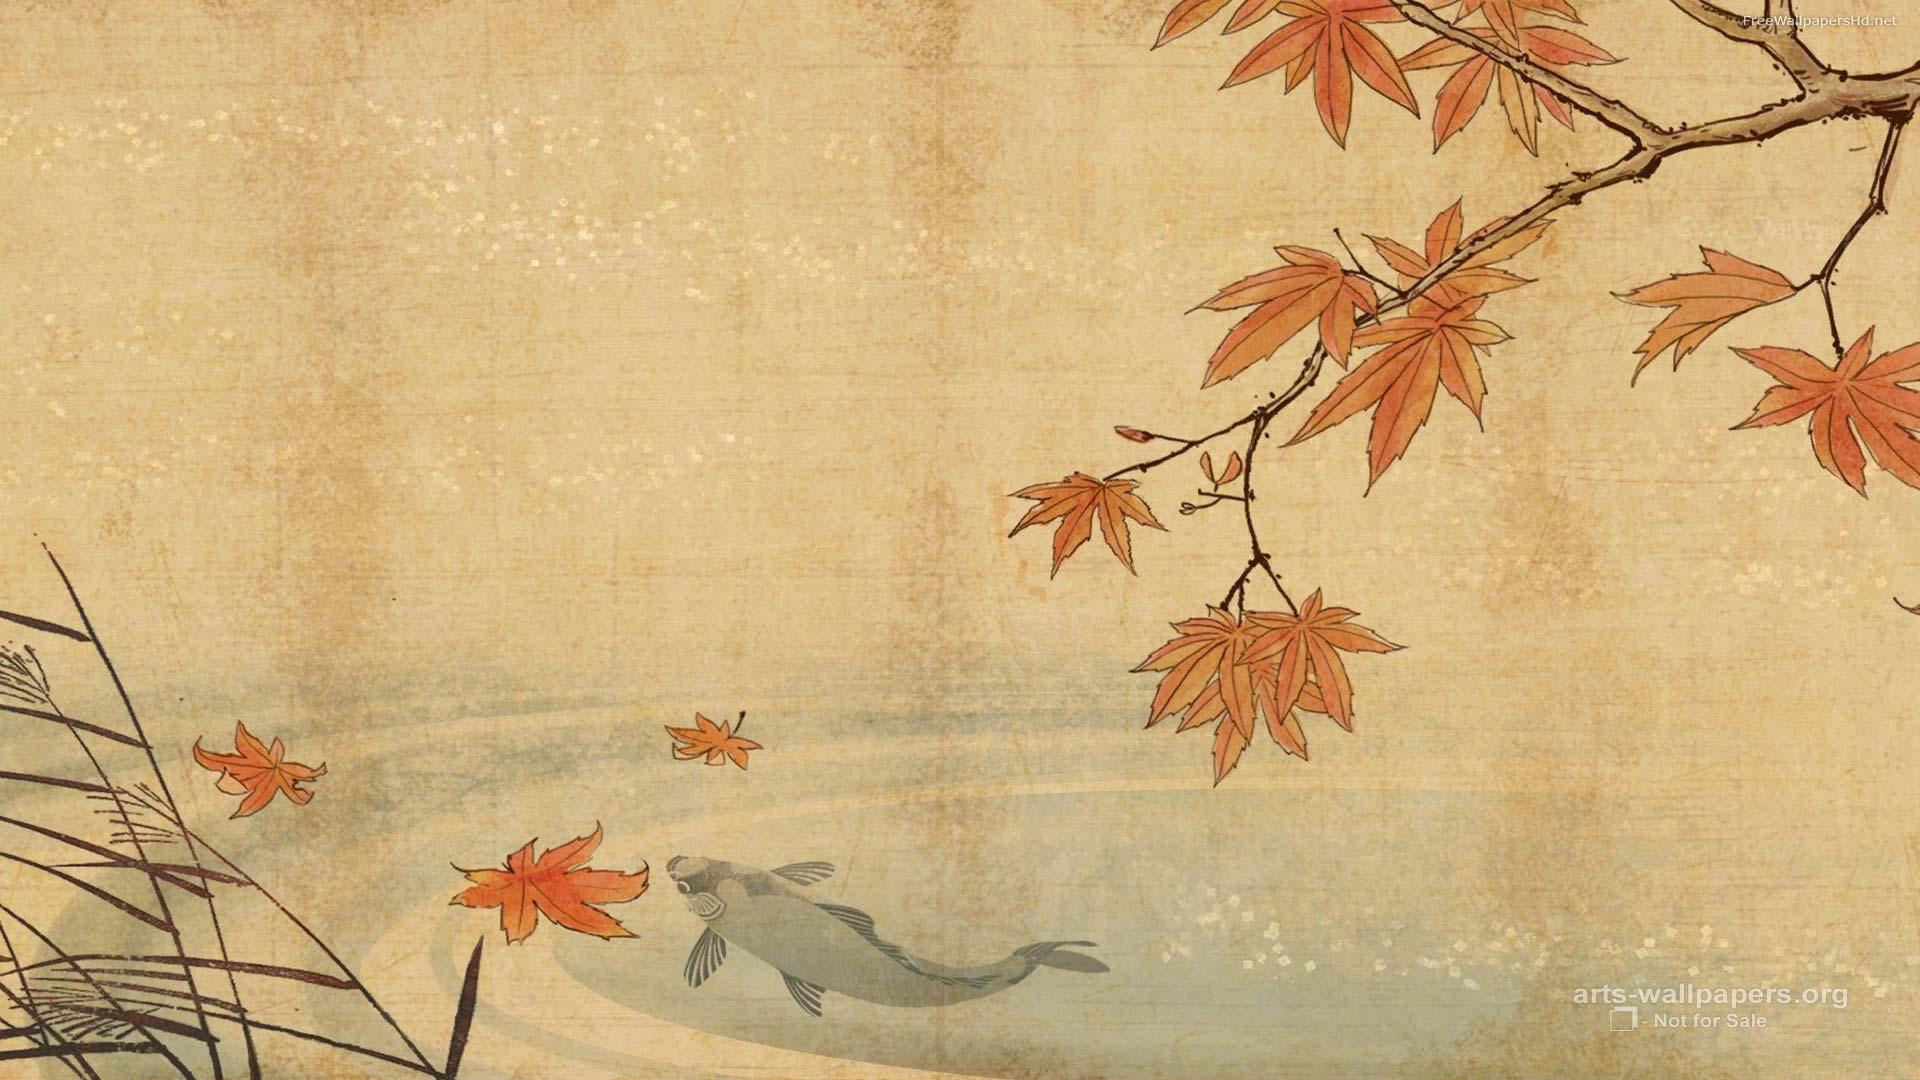 Amazing Wallpaper High Resolution Painting - Chinese-Wallpaper-010  Image_899817.jpg